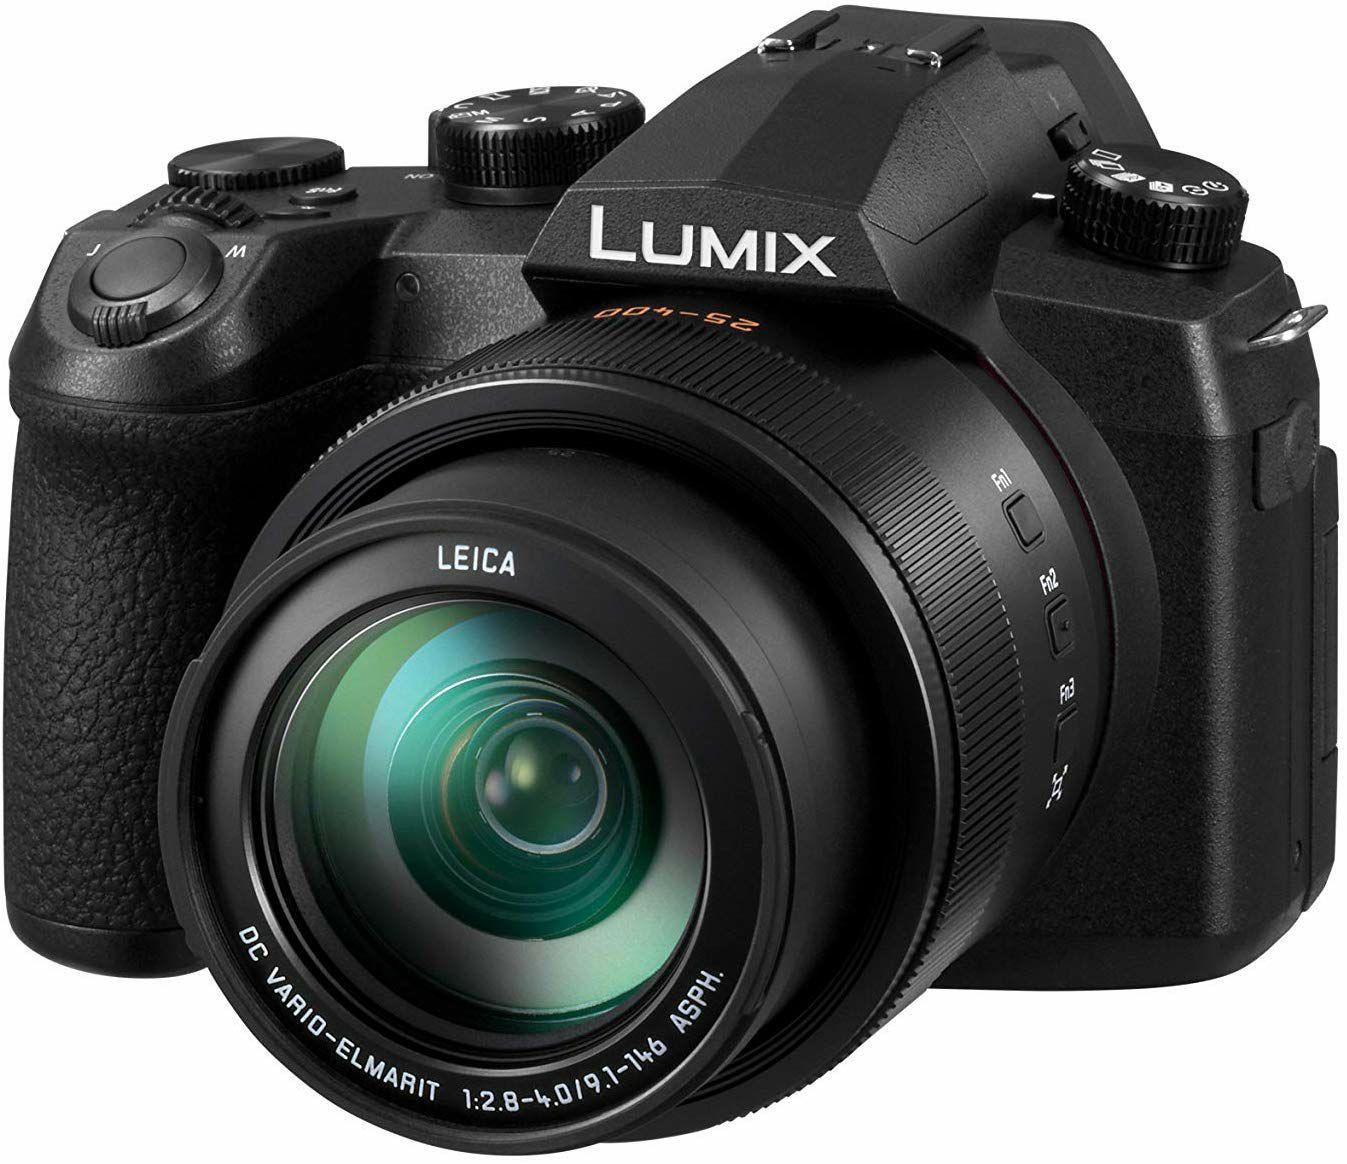 [Vorbestellung] Panasonic Lumix DC-FZ1000 II Bridgekamera (Amazon UK)